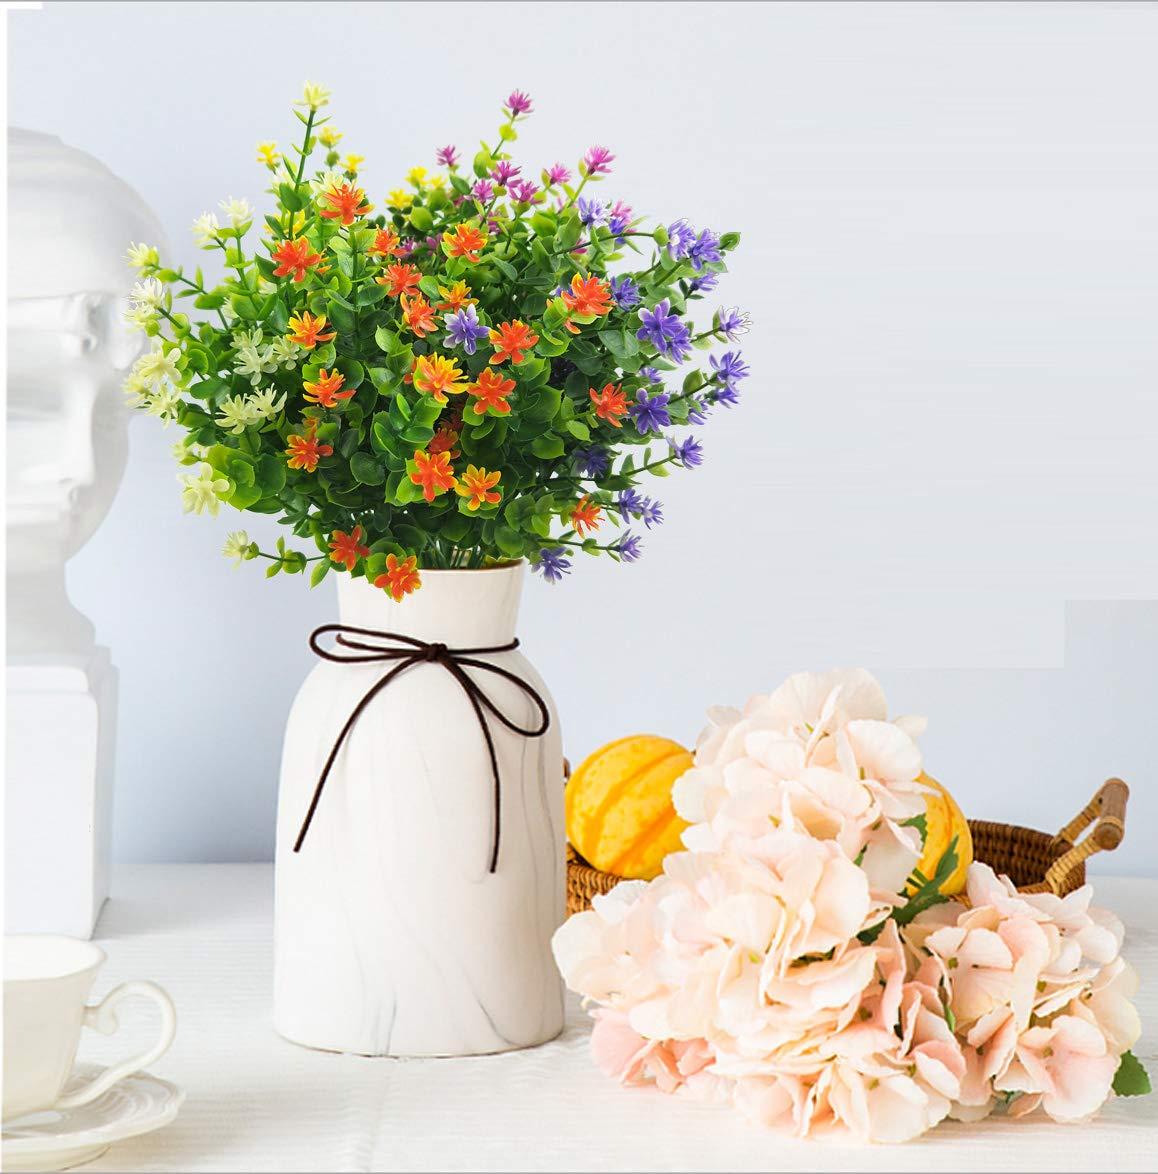 LUCKY-SNAIL-Artificial-Flowers-Fake-Outdoor-UV-Resistant-Boxwood-Shrubs-Plants-Lifelike-Plastic-Flowers-for-Indoor-Outdoors-Home-Office-Garden-Wedding-Sidewalk-Trim-Decor5-PcsMixture